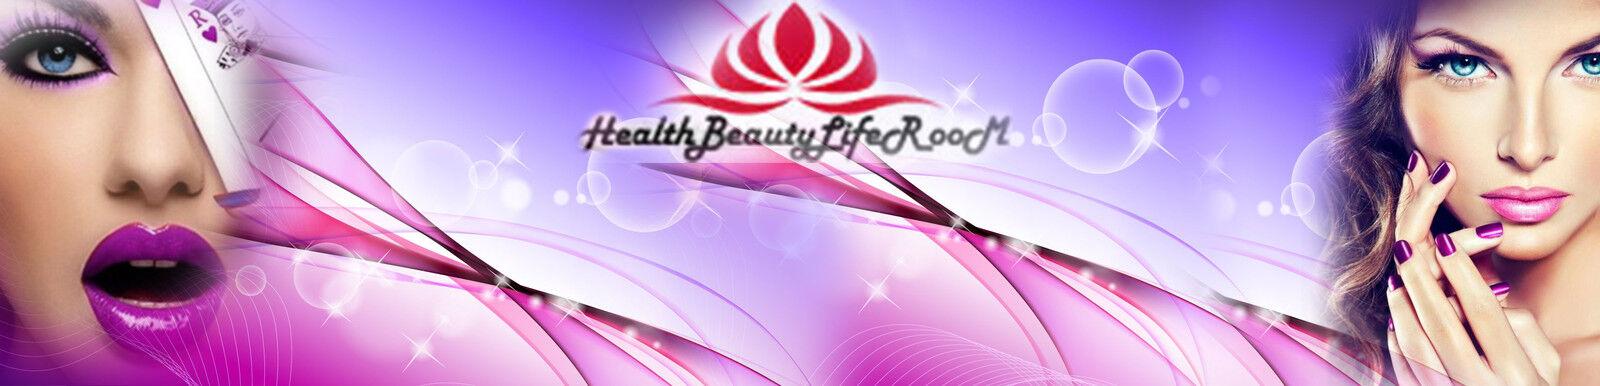 healthbeautylife shop